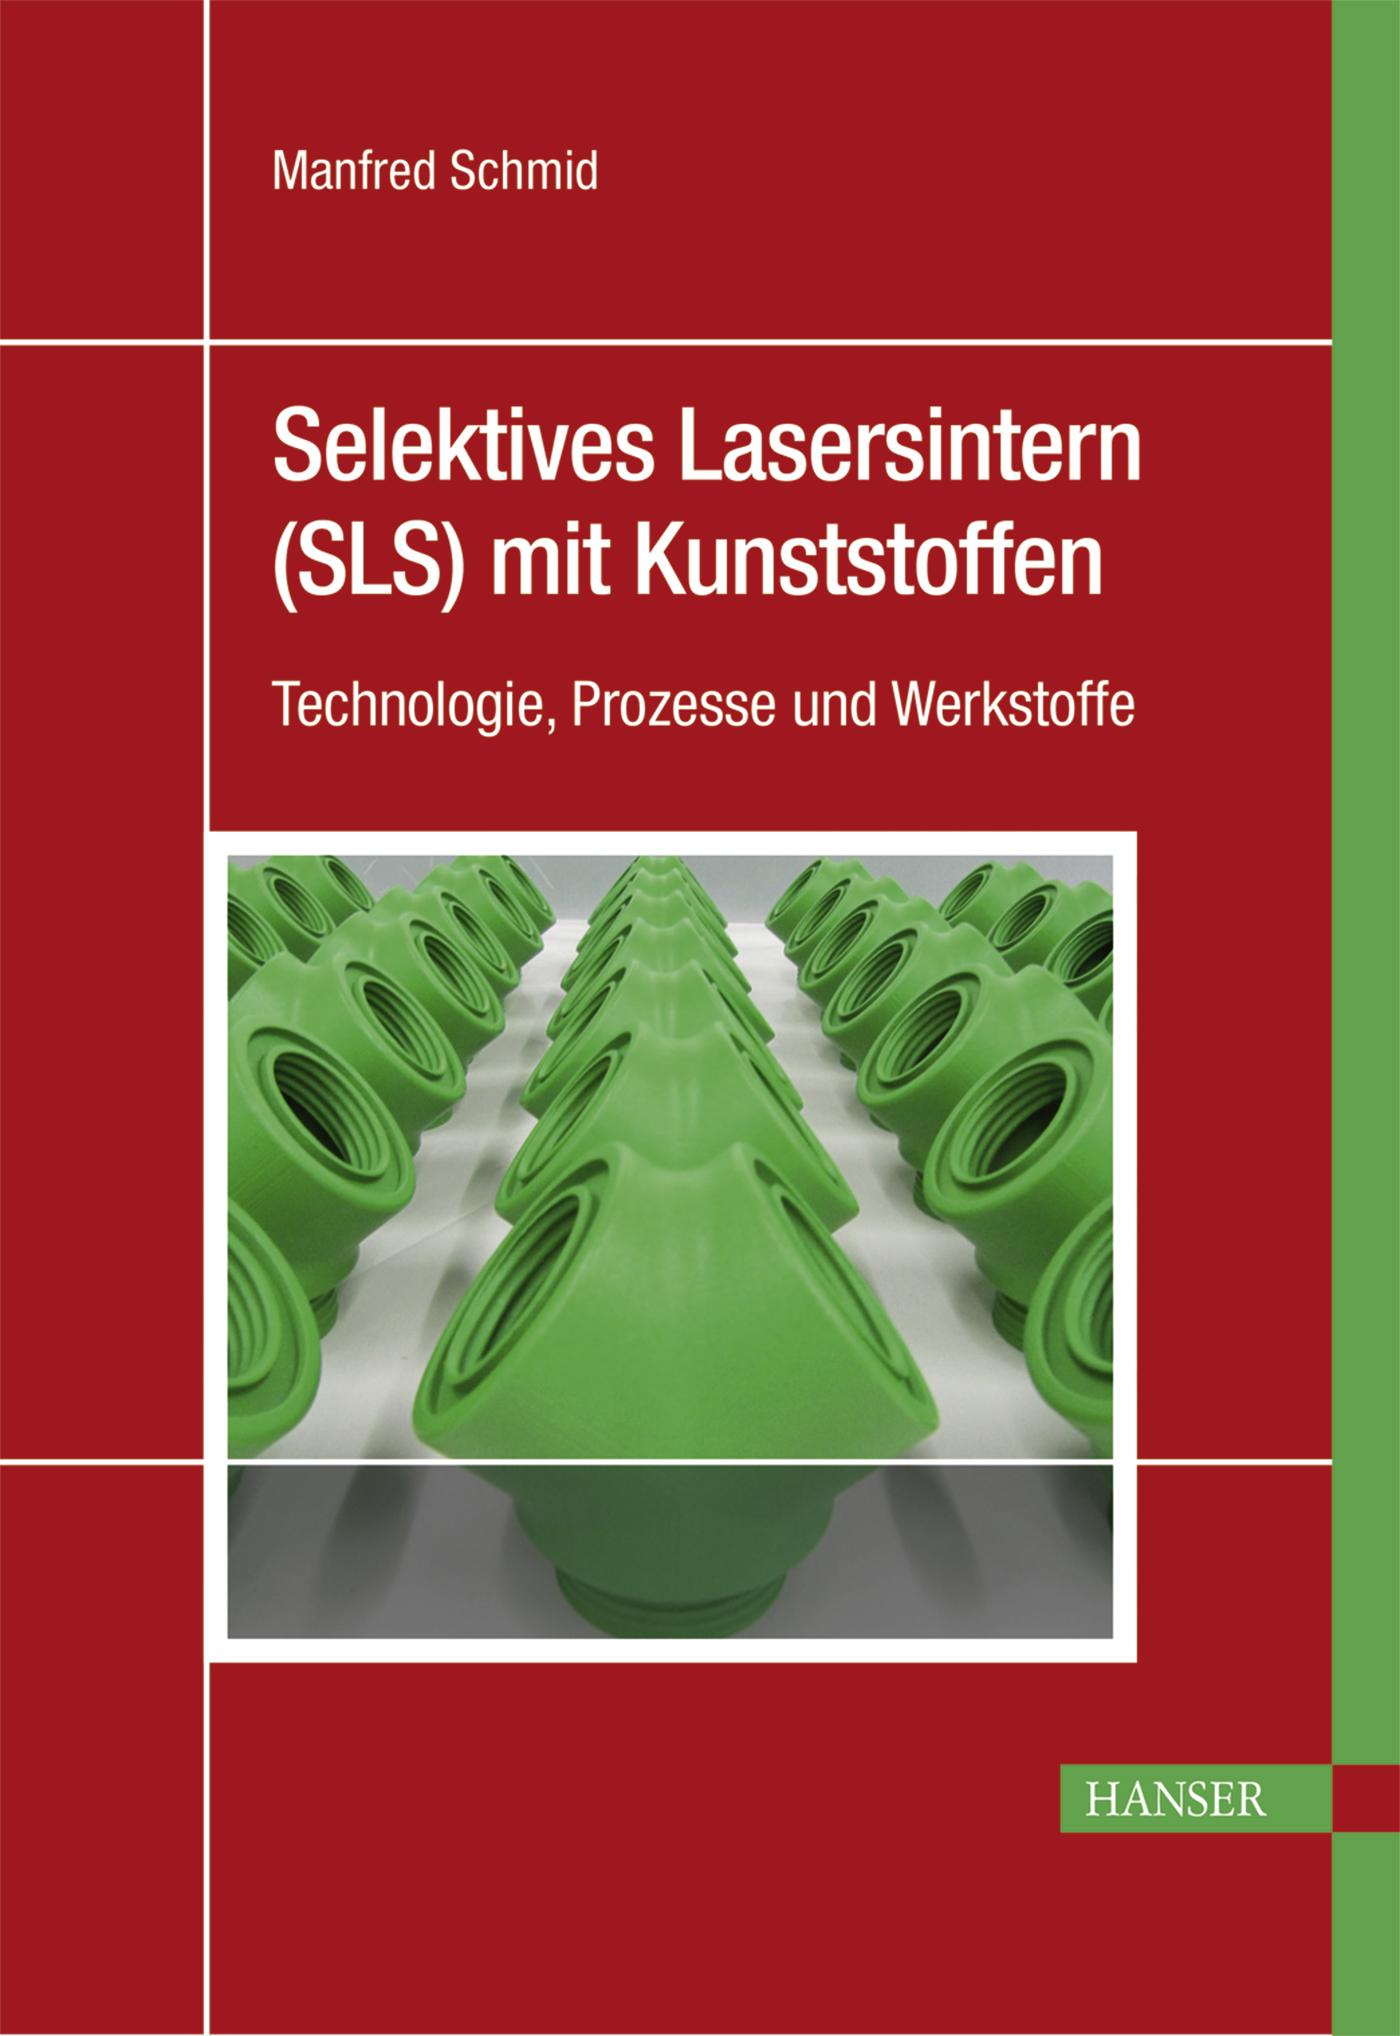 Schmid, Selektives Lasersintern (SLS) mit Kunststoffen, 978-3-446-44562-8